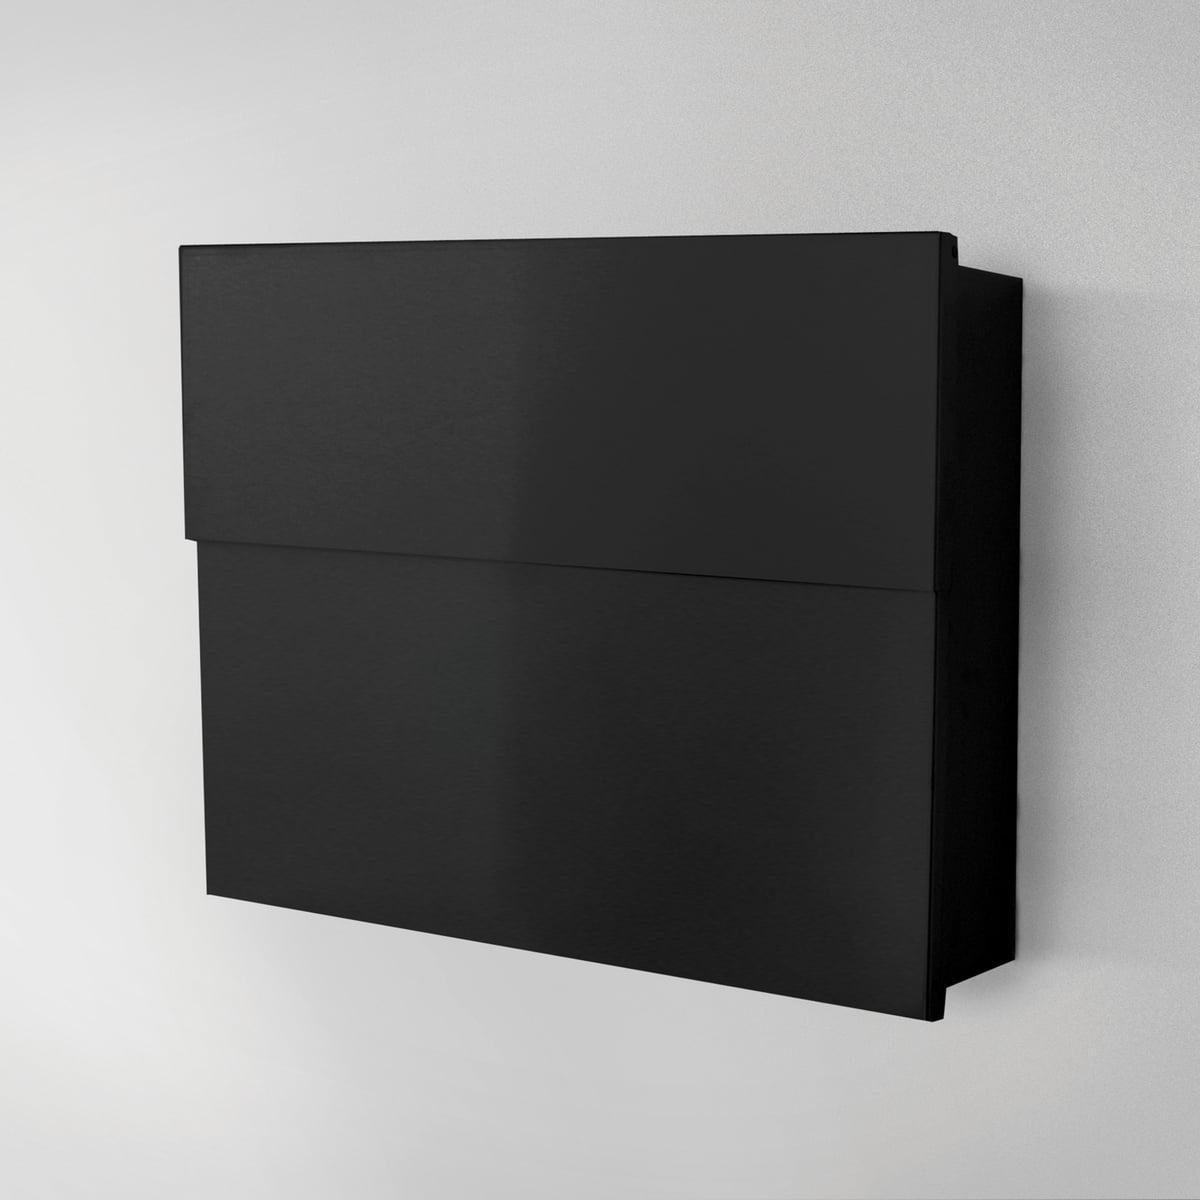 Radius Letterman letterman ii by radius design connox